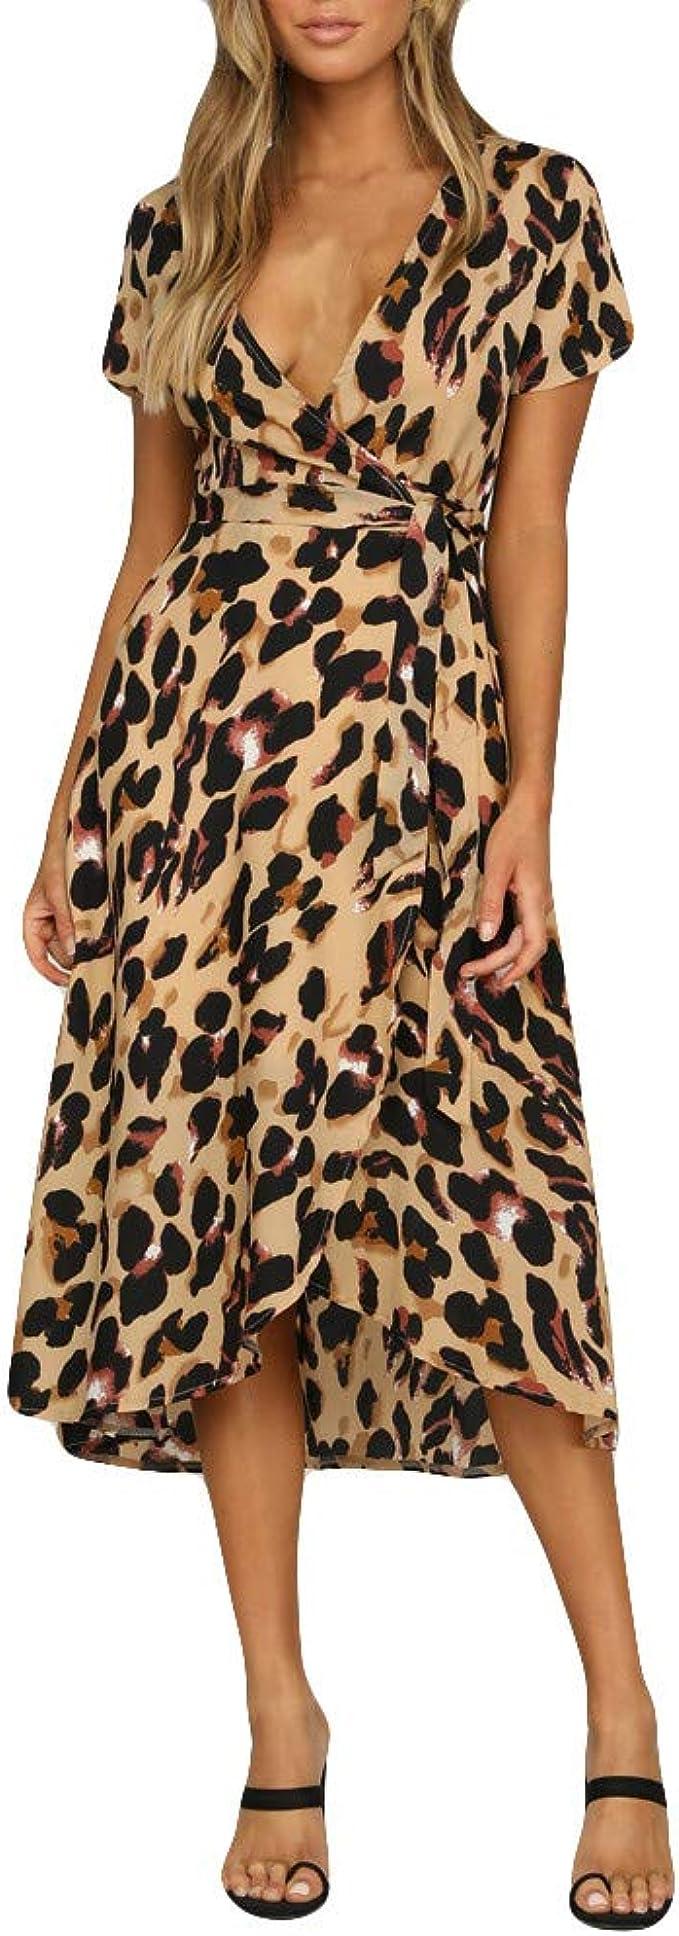 Sommer Kleid Kleider Sommerkleider Damen Leoparden Elegant Vintage